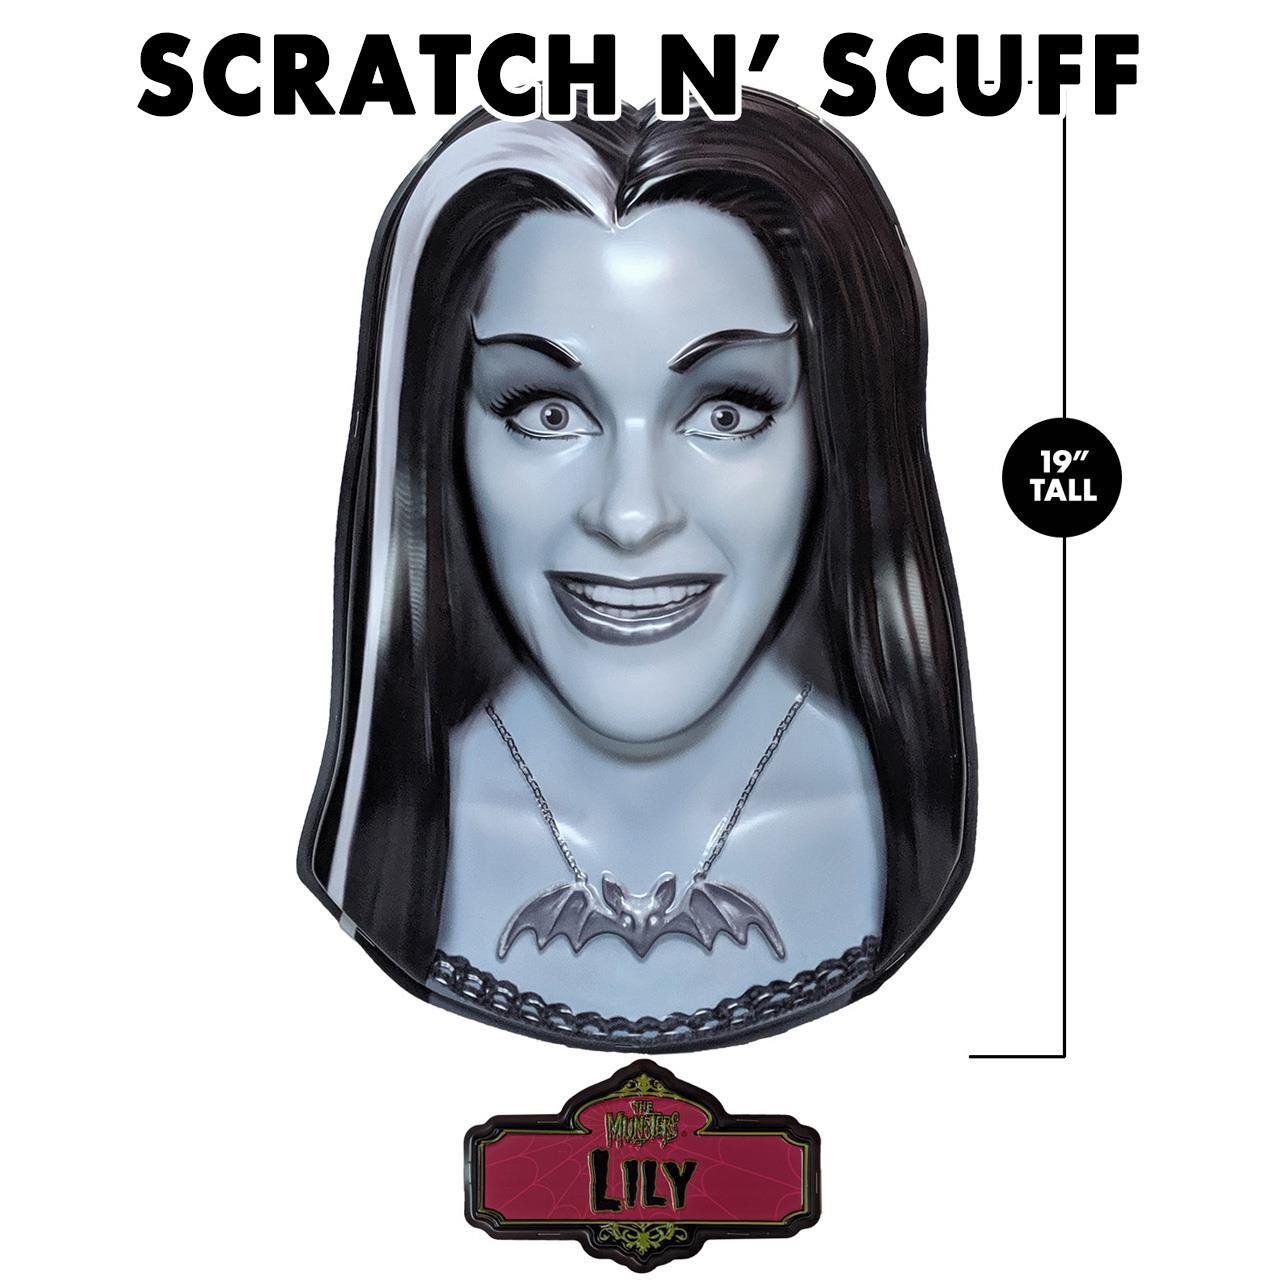 Scratch 'n Scuff Lily Munster 3-D Wall Decor* -